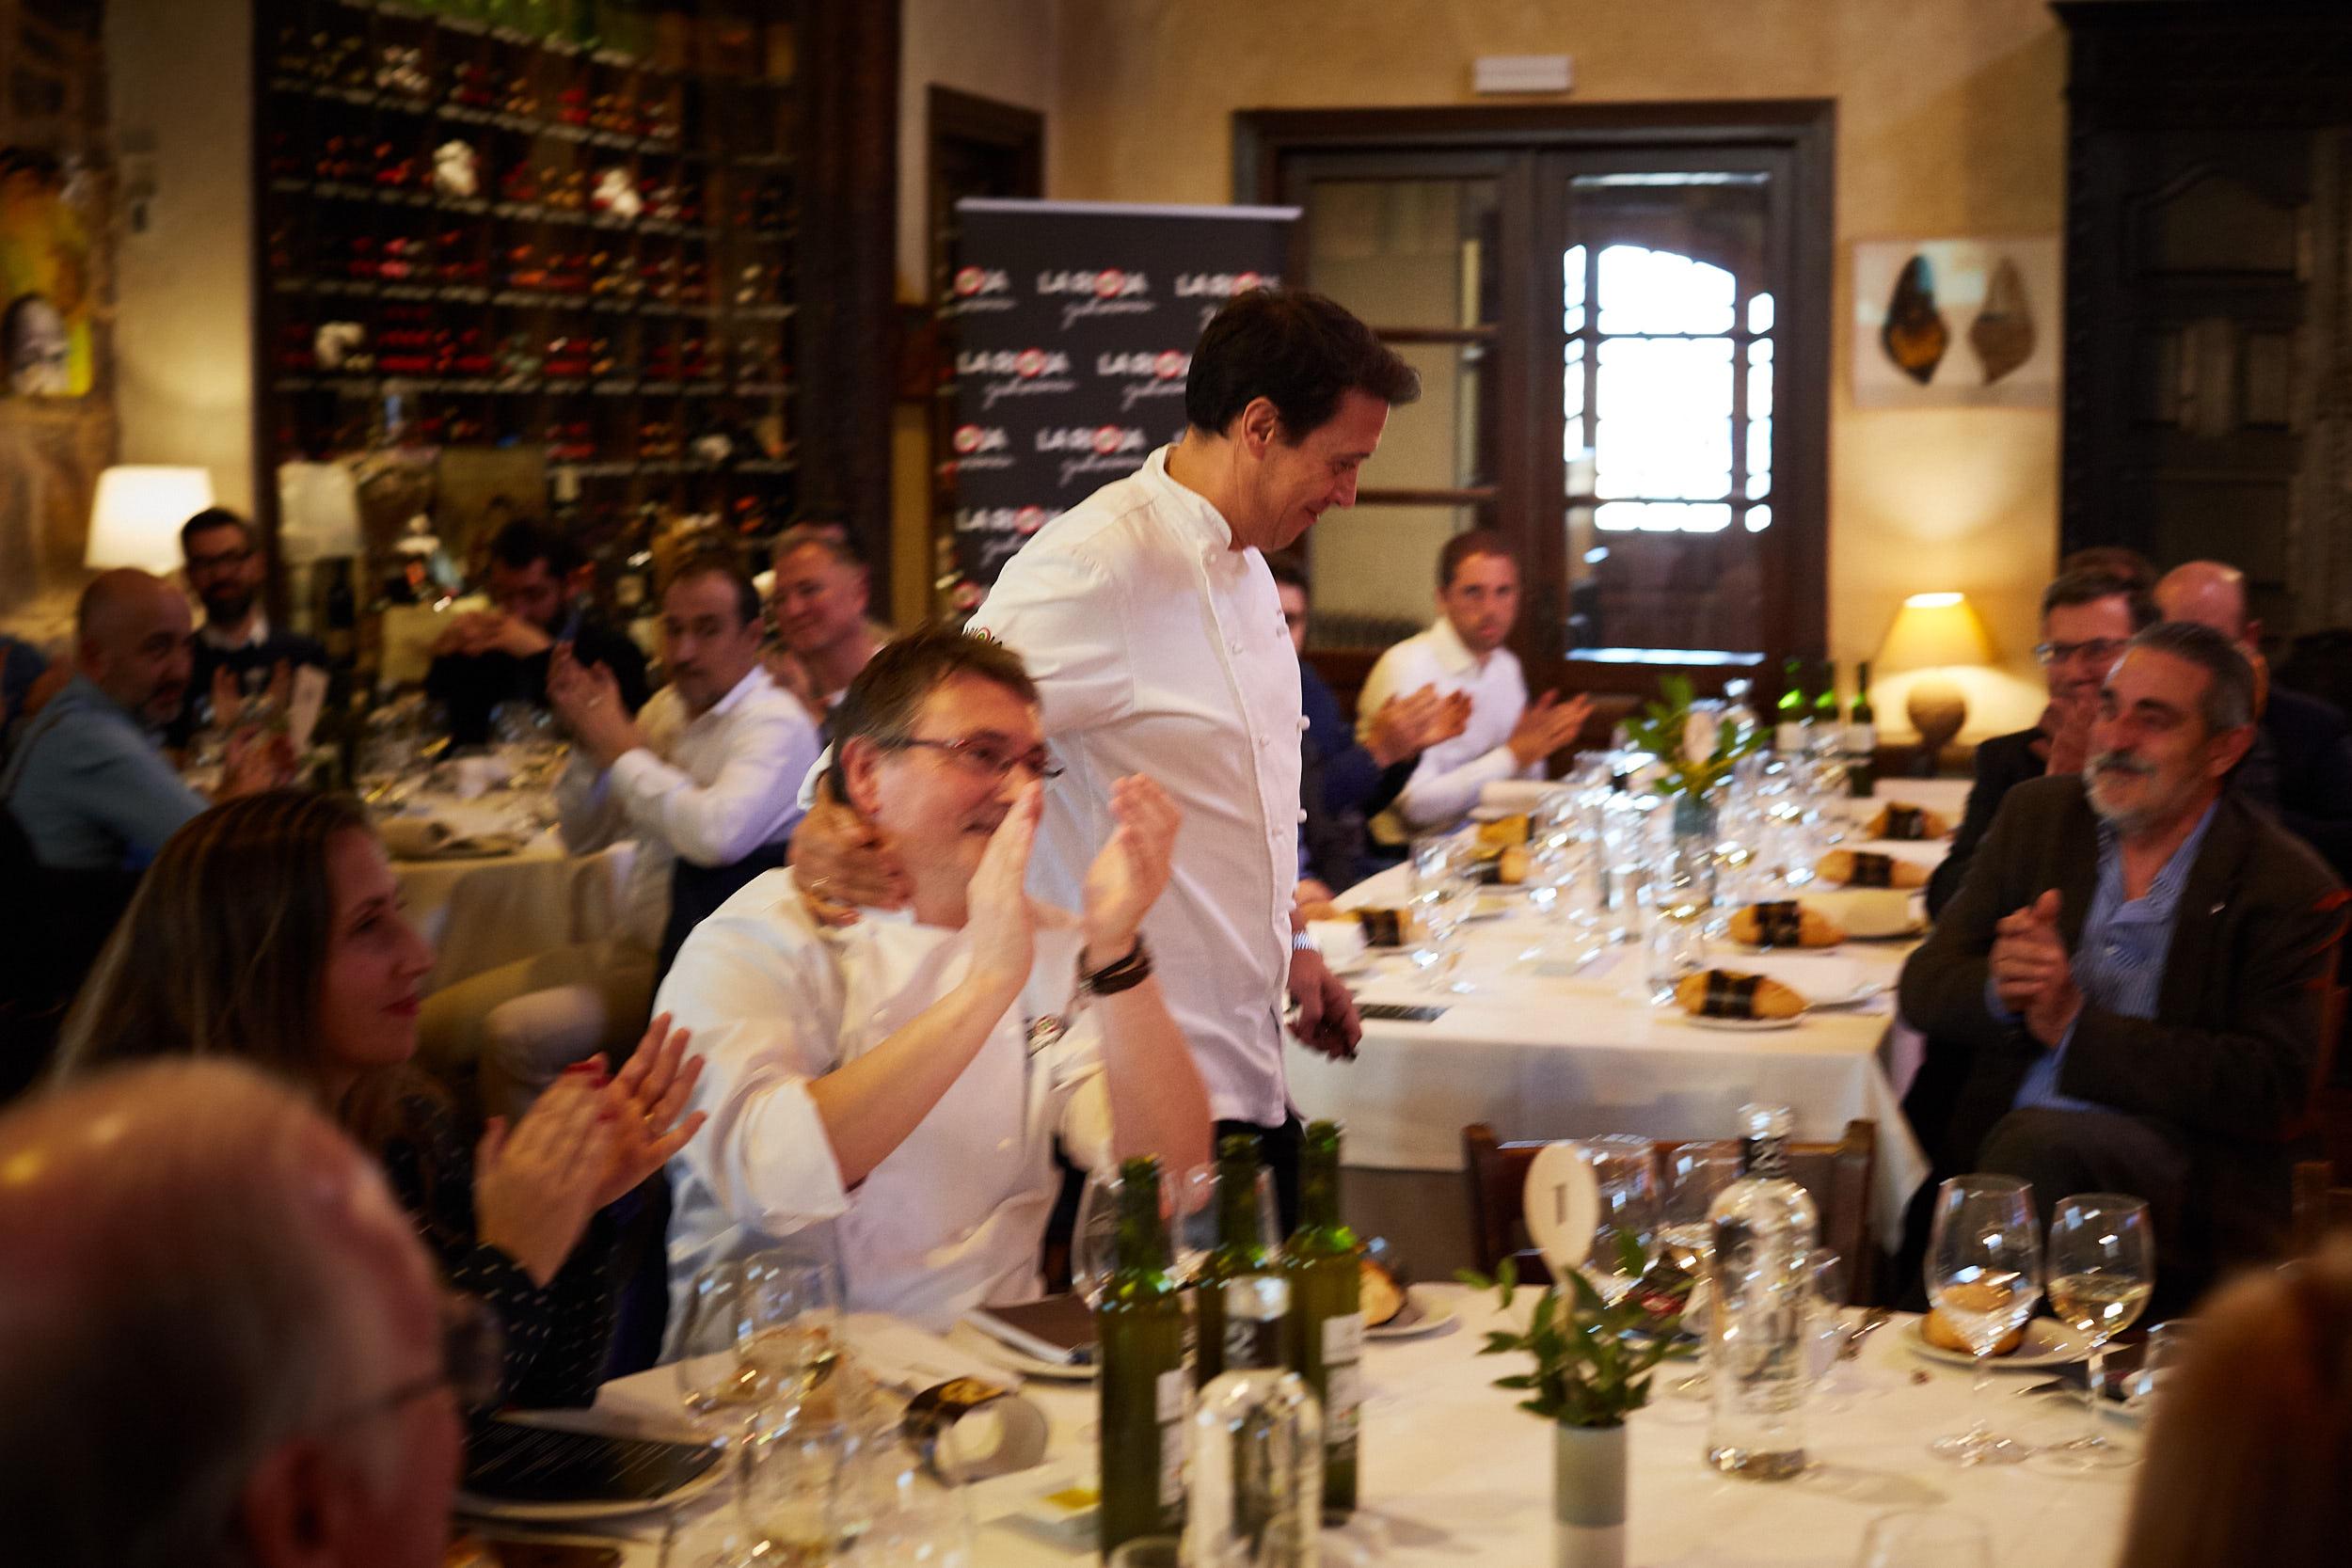 1903Restaurante_La_Vieja_Bodega_Casalarreina_La_Rioja_Spain_Sturcke_0008.jpg